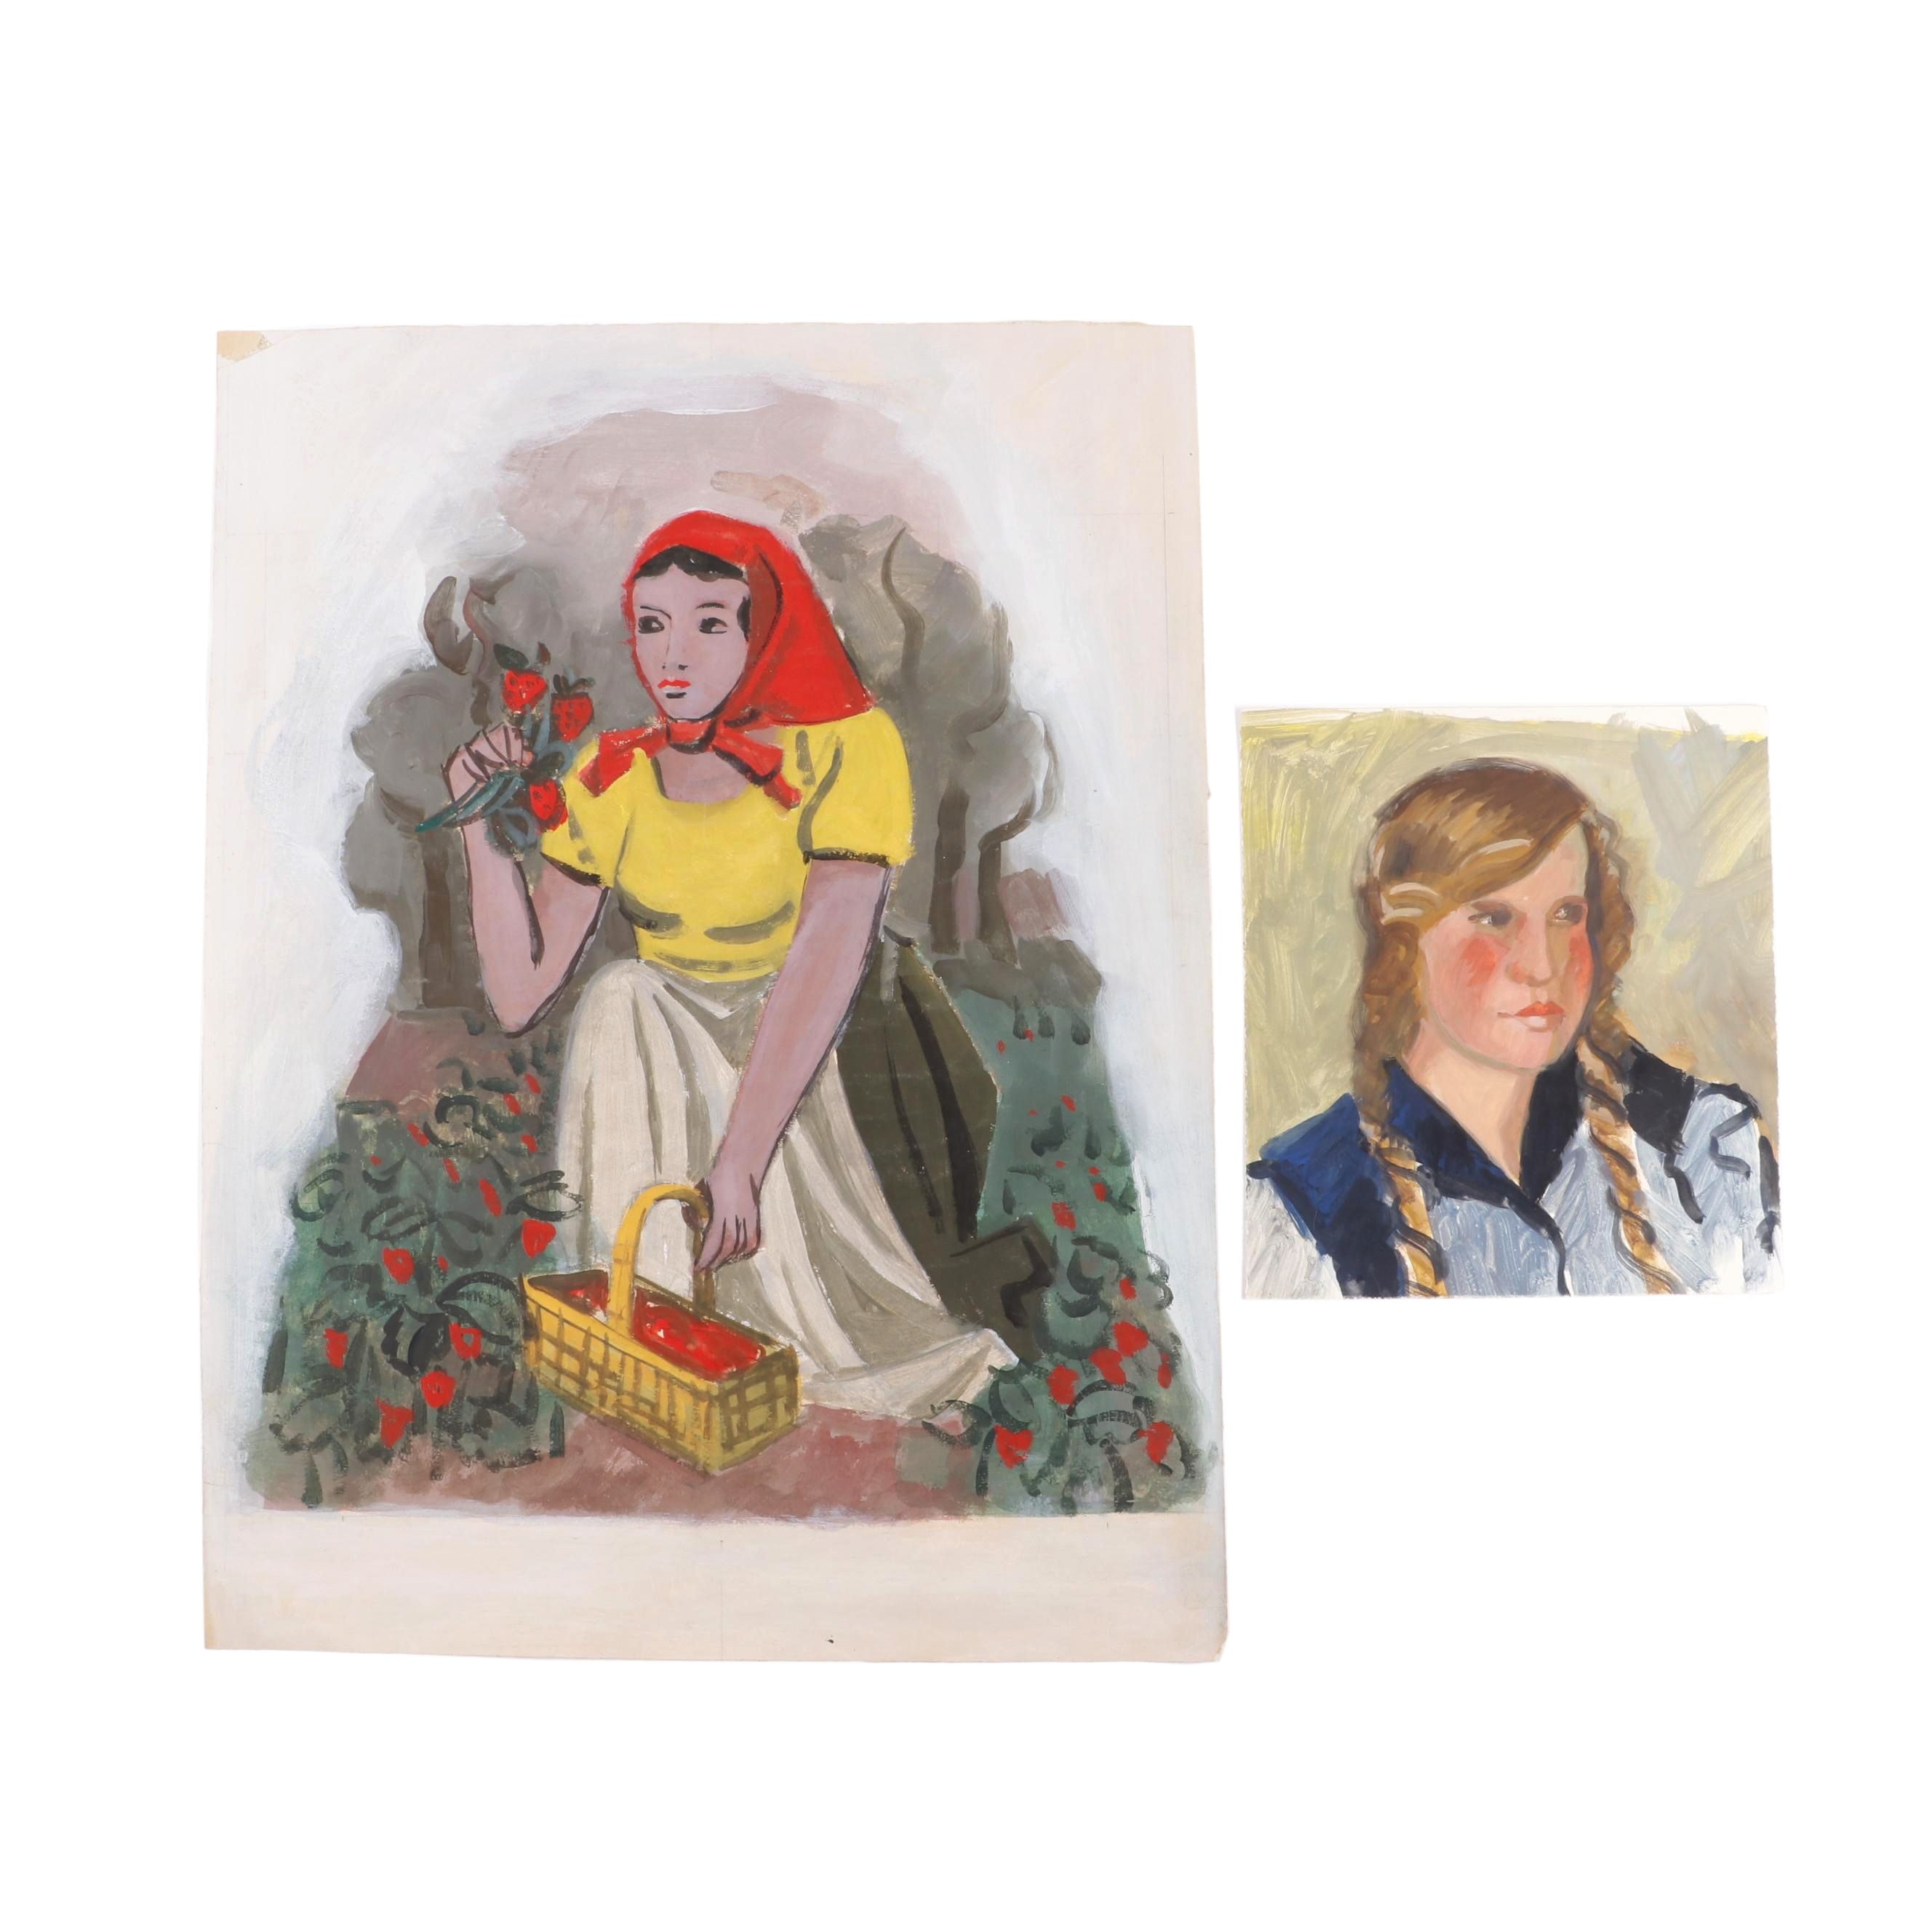 Gouache Paintings of Women